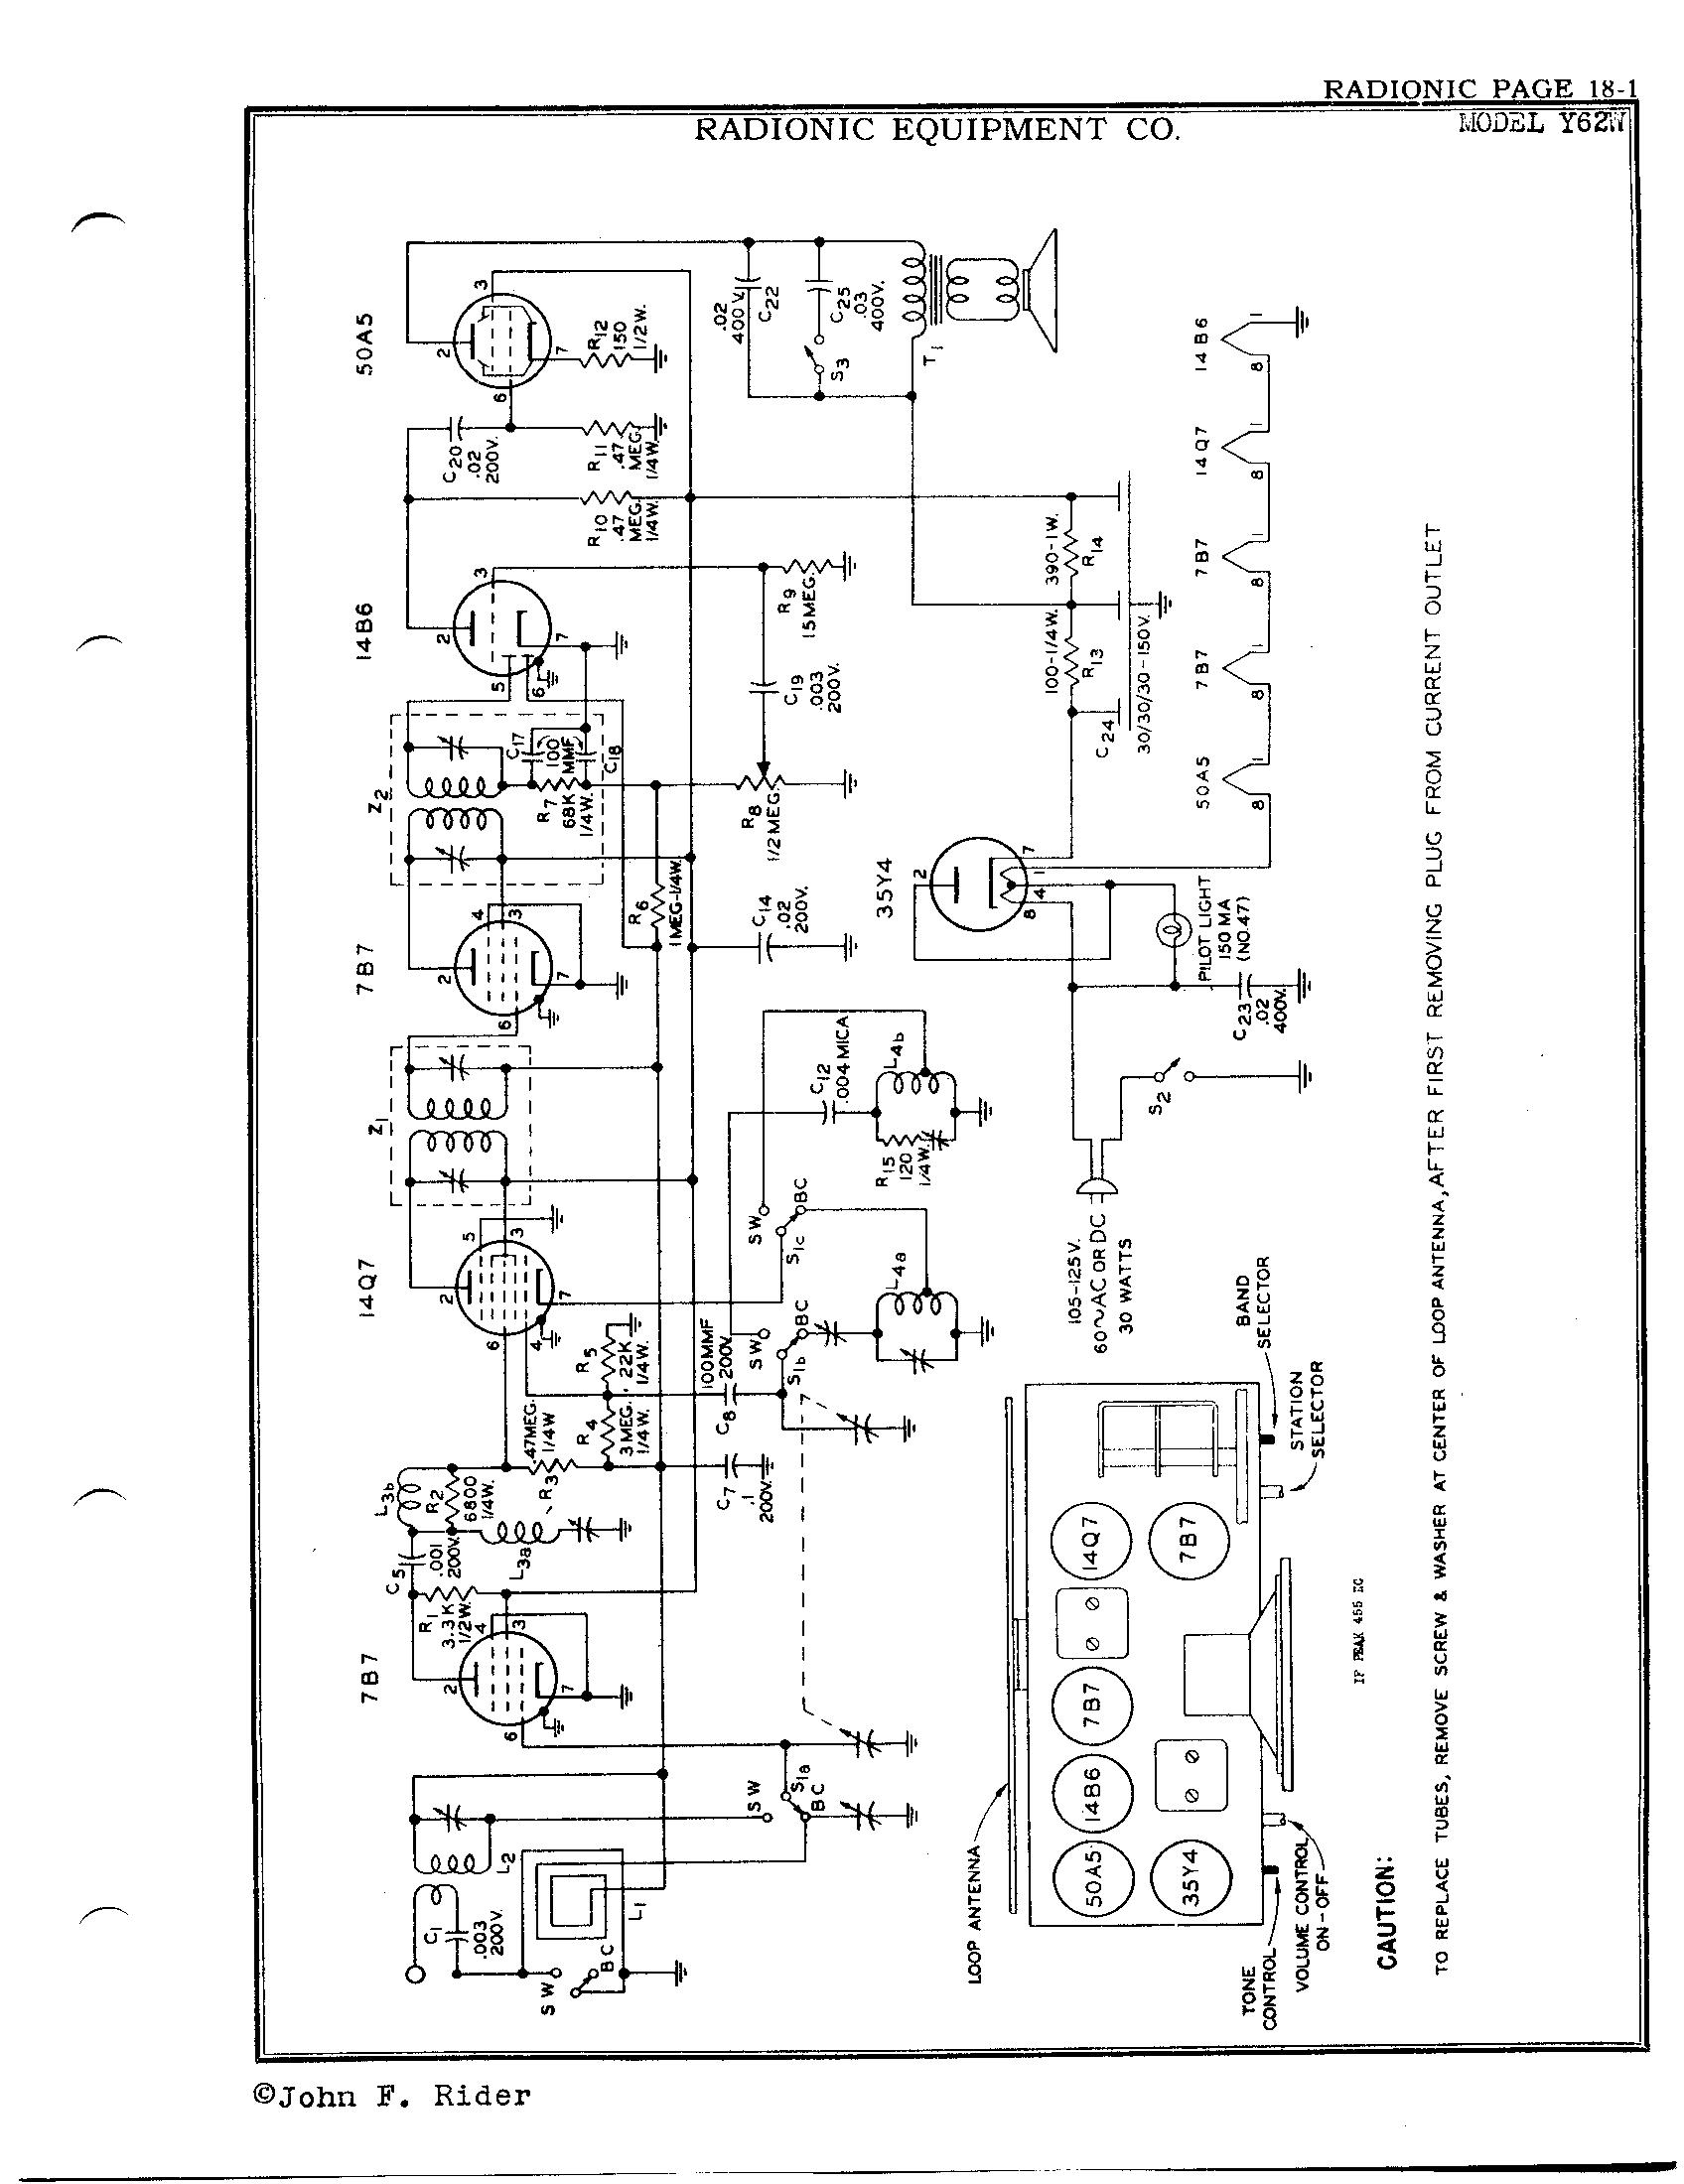 Radionic Equipment Co Y62w